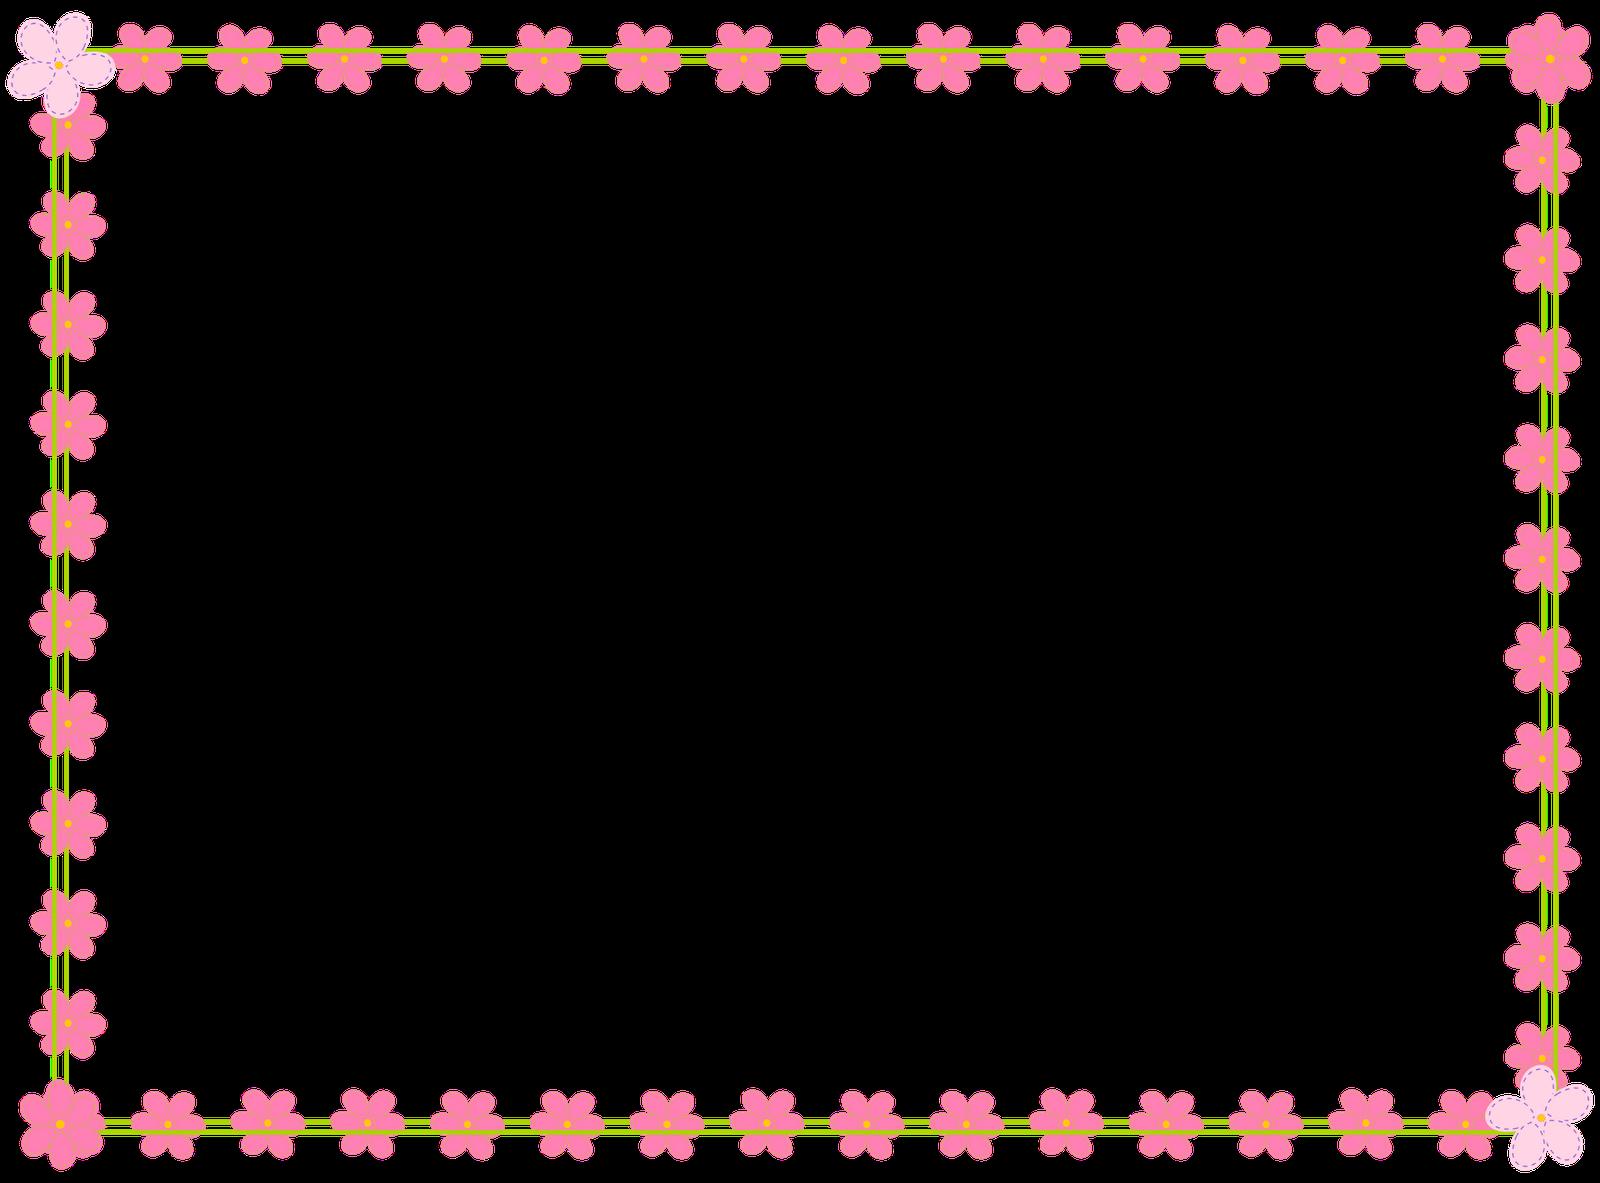 Scrapbook clipart clear background. Free digital flower border